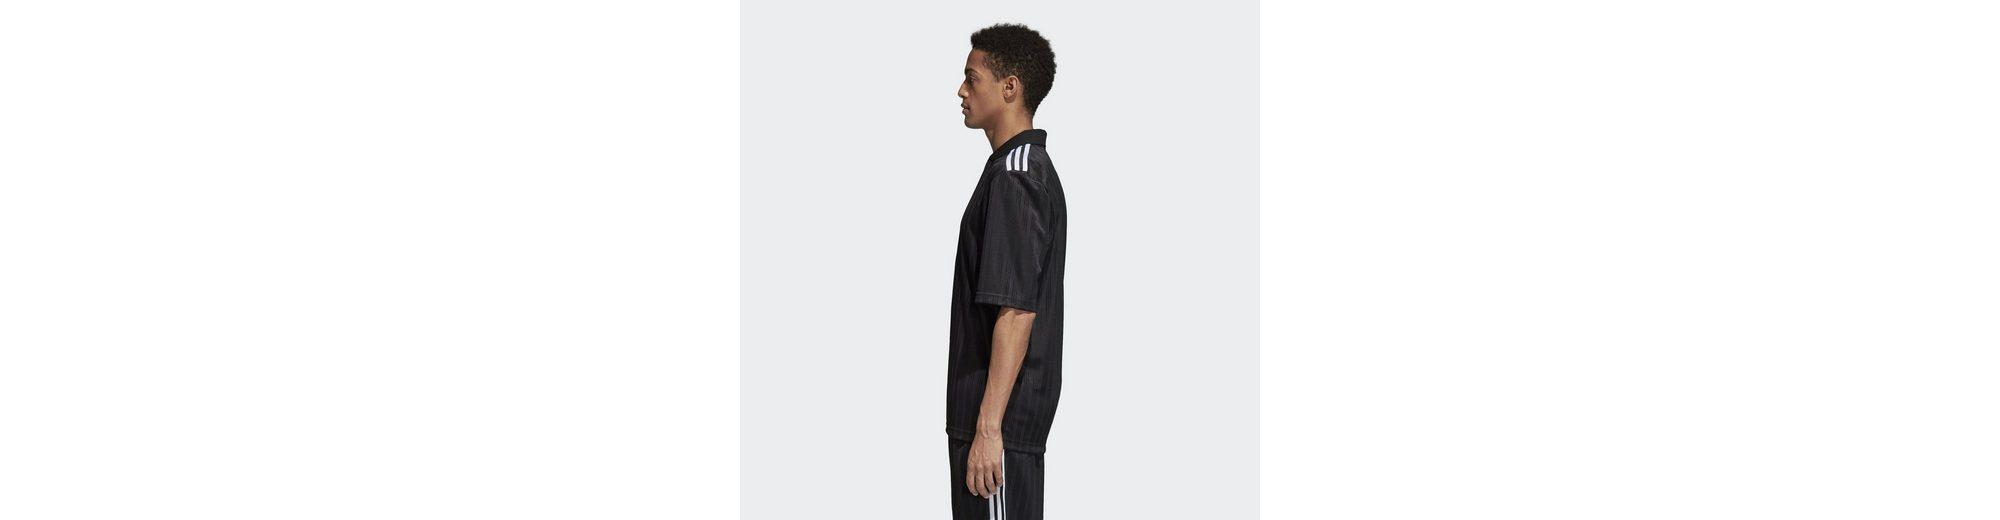 adidas Originals Sporttop Football Shirt Spielraum Offiziellen 7wP2XSTYp